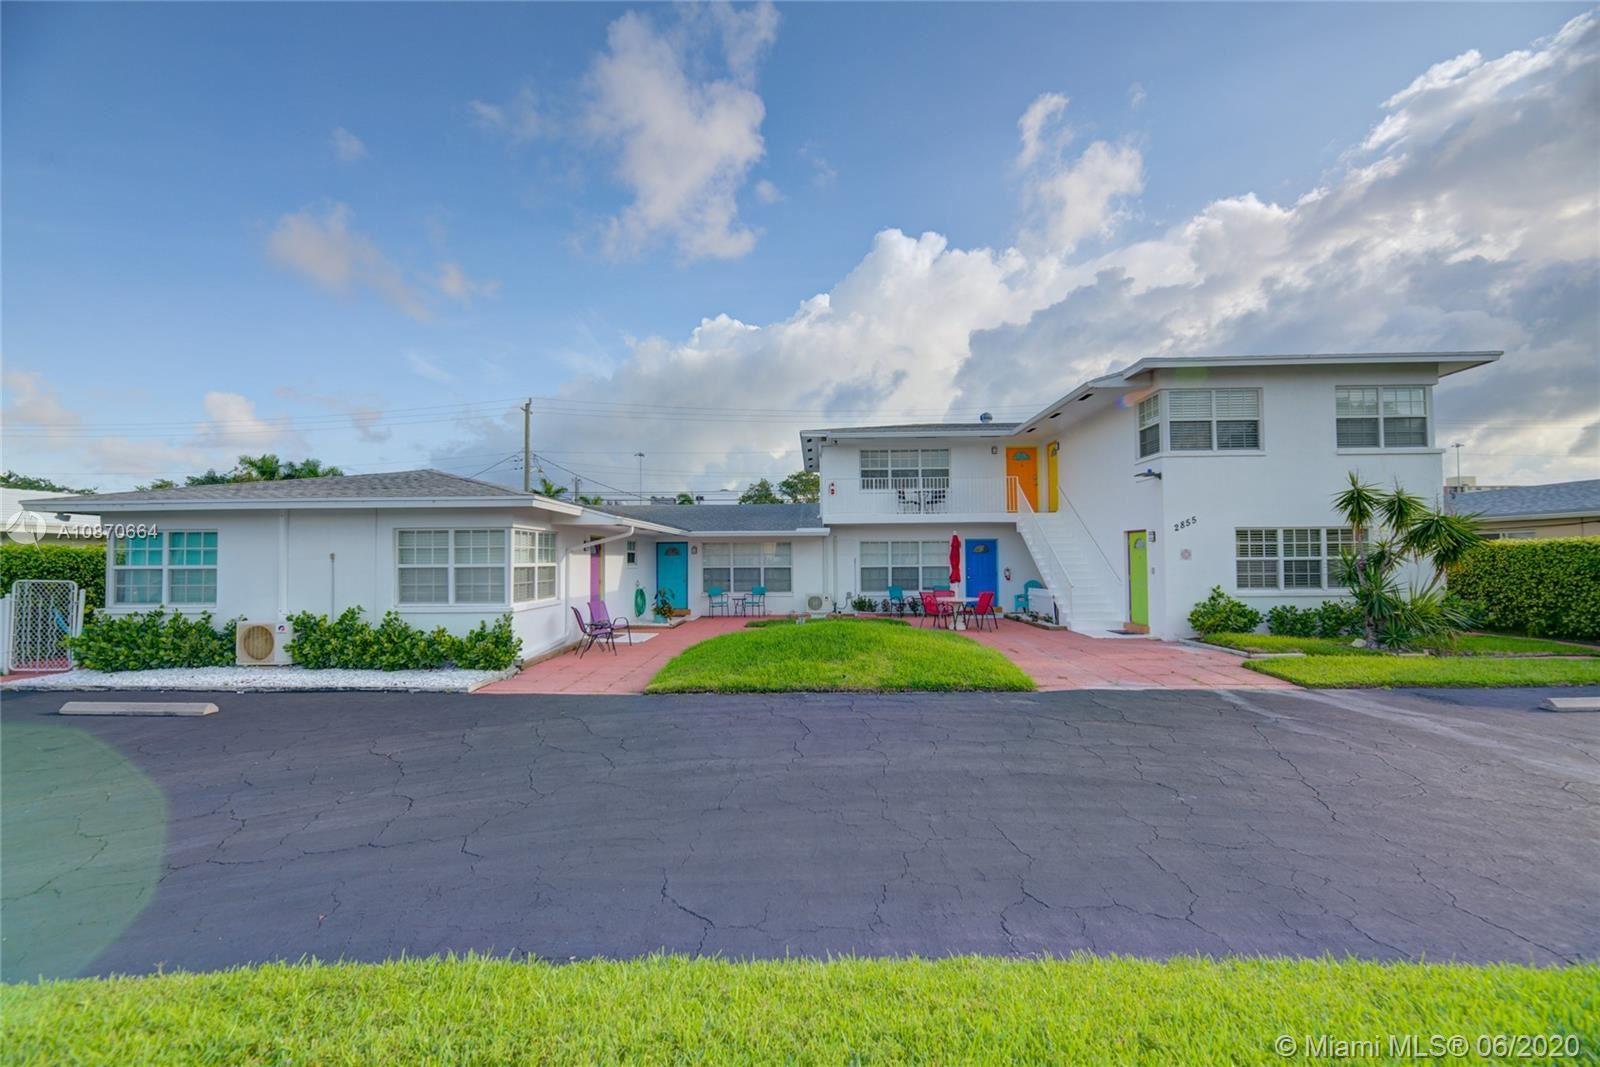 Photo of 2855 NE 30th St #E, Fort Lauderdale, FL 33306 (MLS # A10870664)